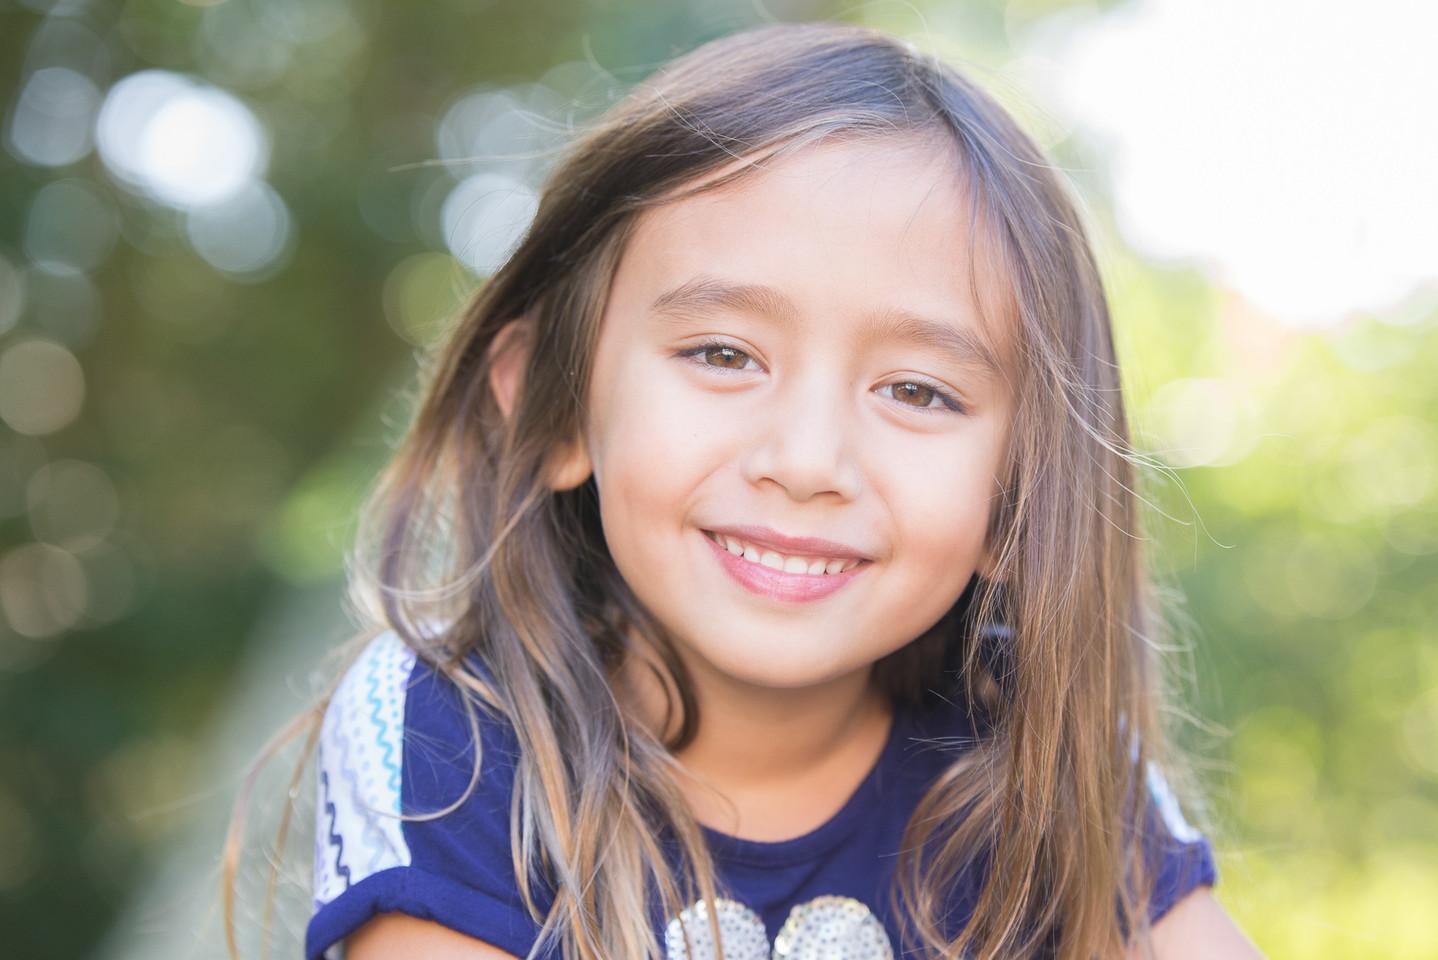 Rye NY New York Jo Bryan JoBryan photo photography solo young girl bokeh blurred background smiling outside